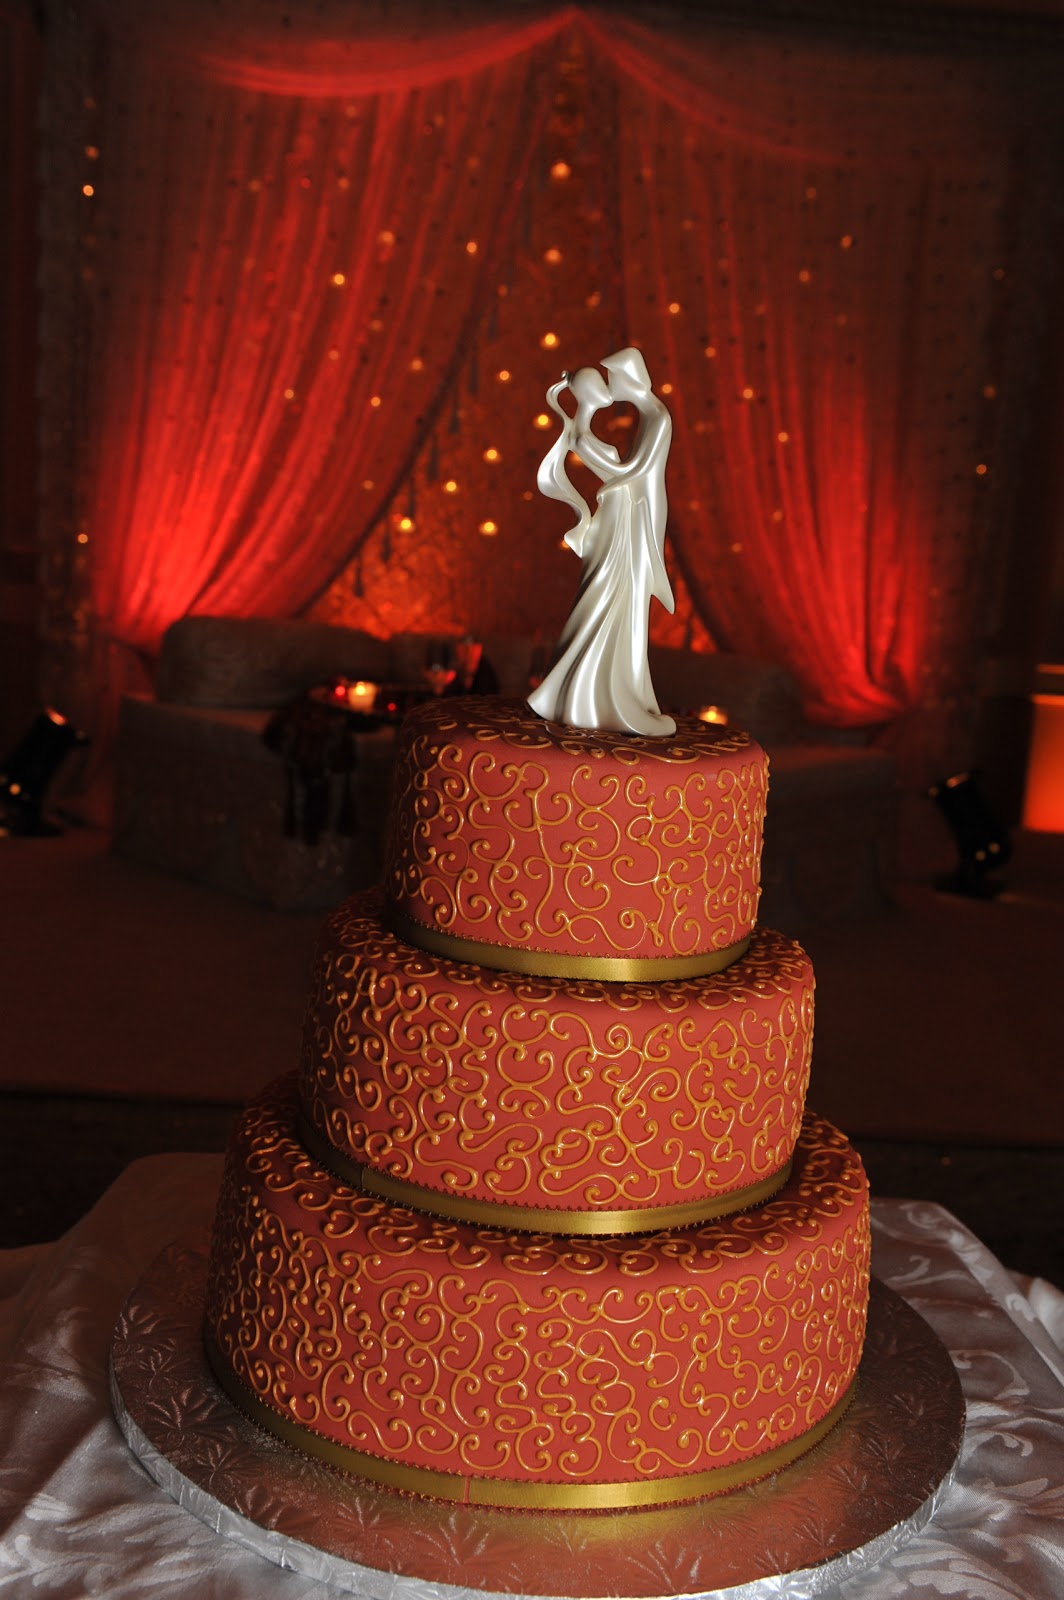 Cake Boss Wedding Cakes submited images